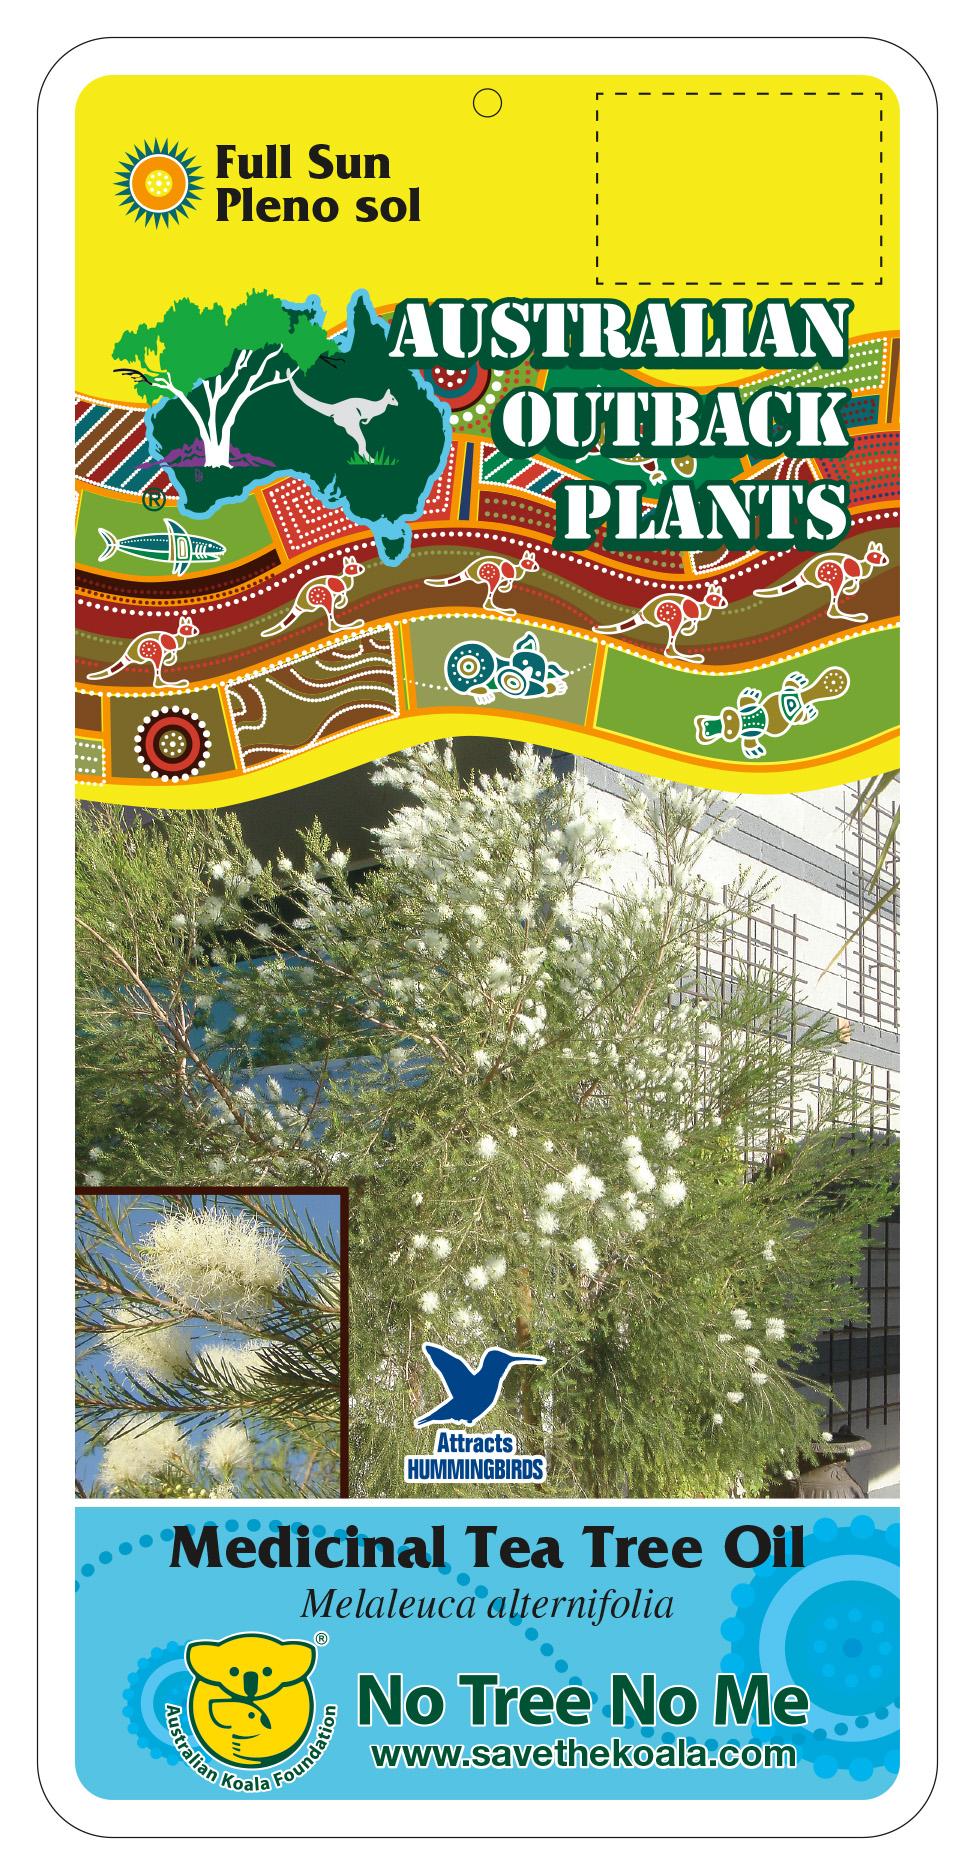 394082_FRONT-Medicinal-Tee-Tree-Oil.jpg